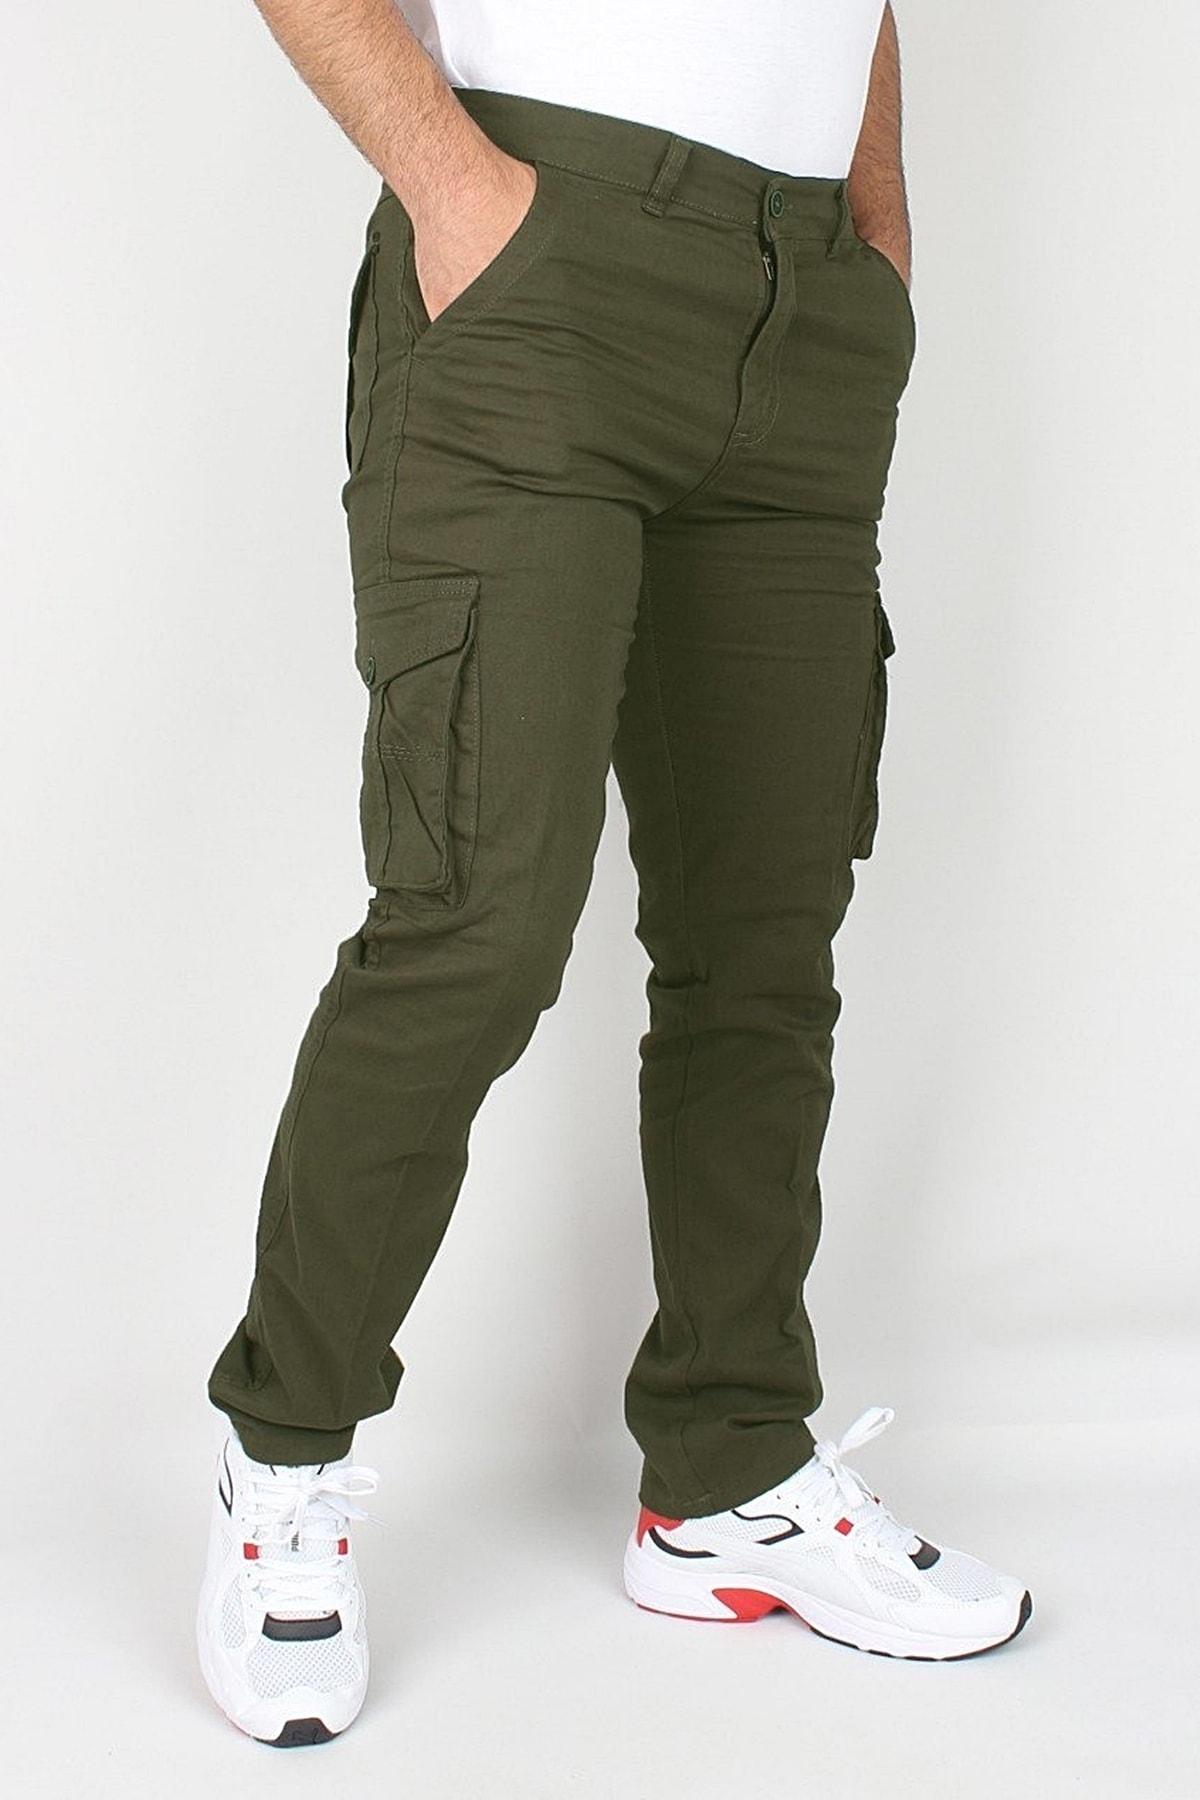 butiksinope Erkek Askeri Kargo Pantolon Haki 1